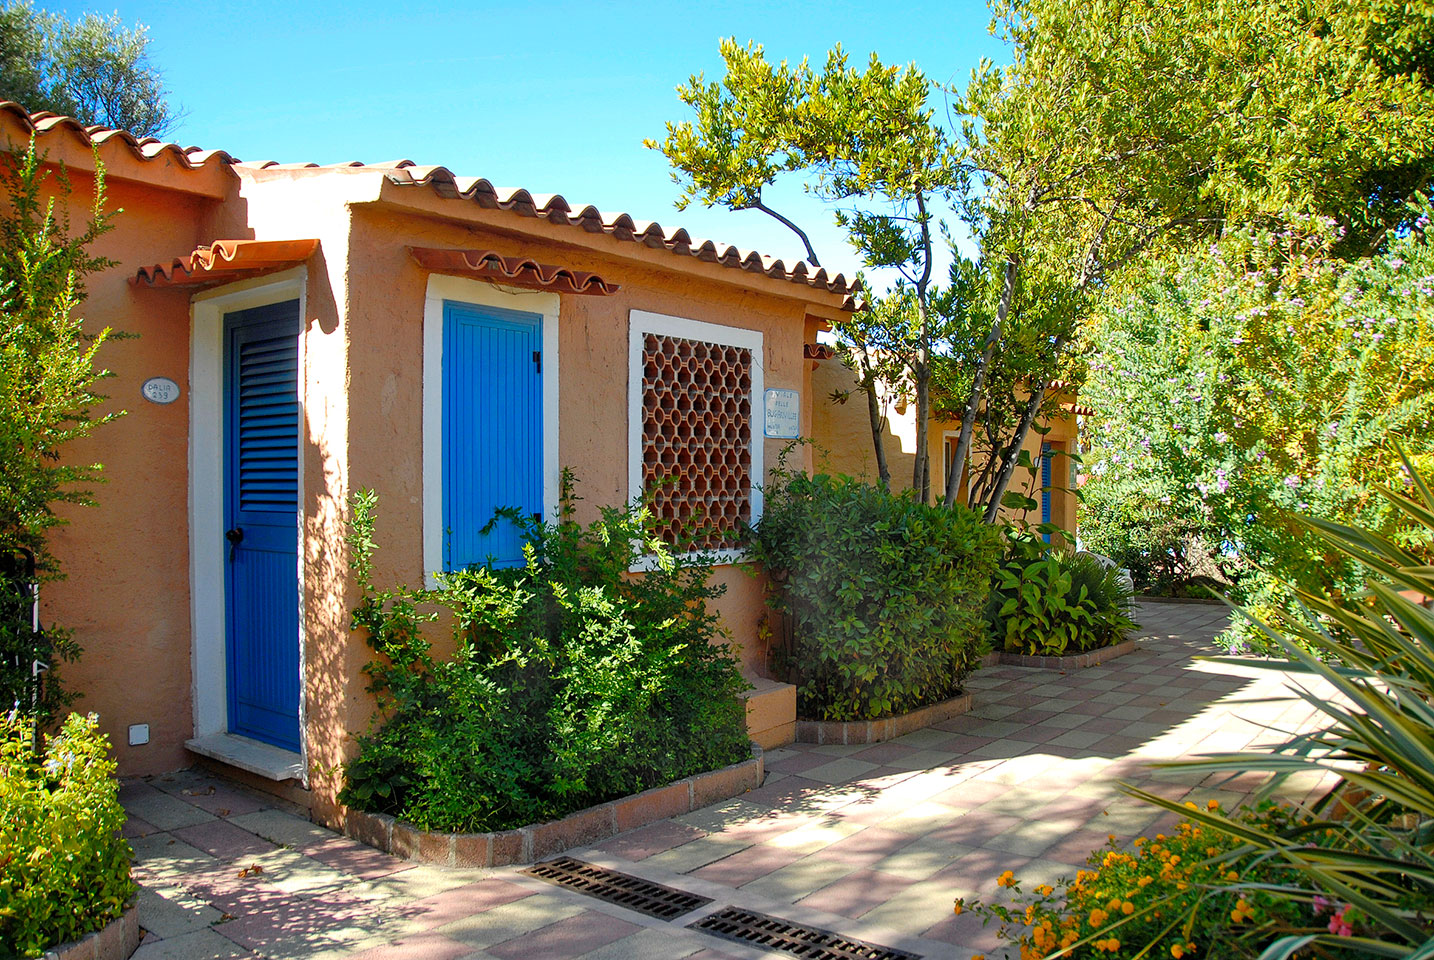 bungalow club village san teodoro sardinien italien On bungalow sardinien